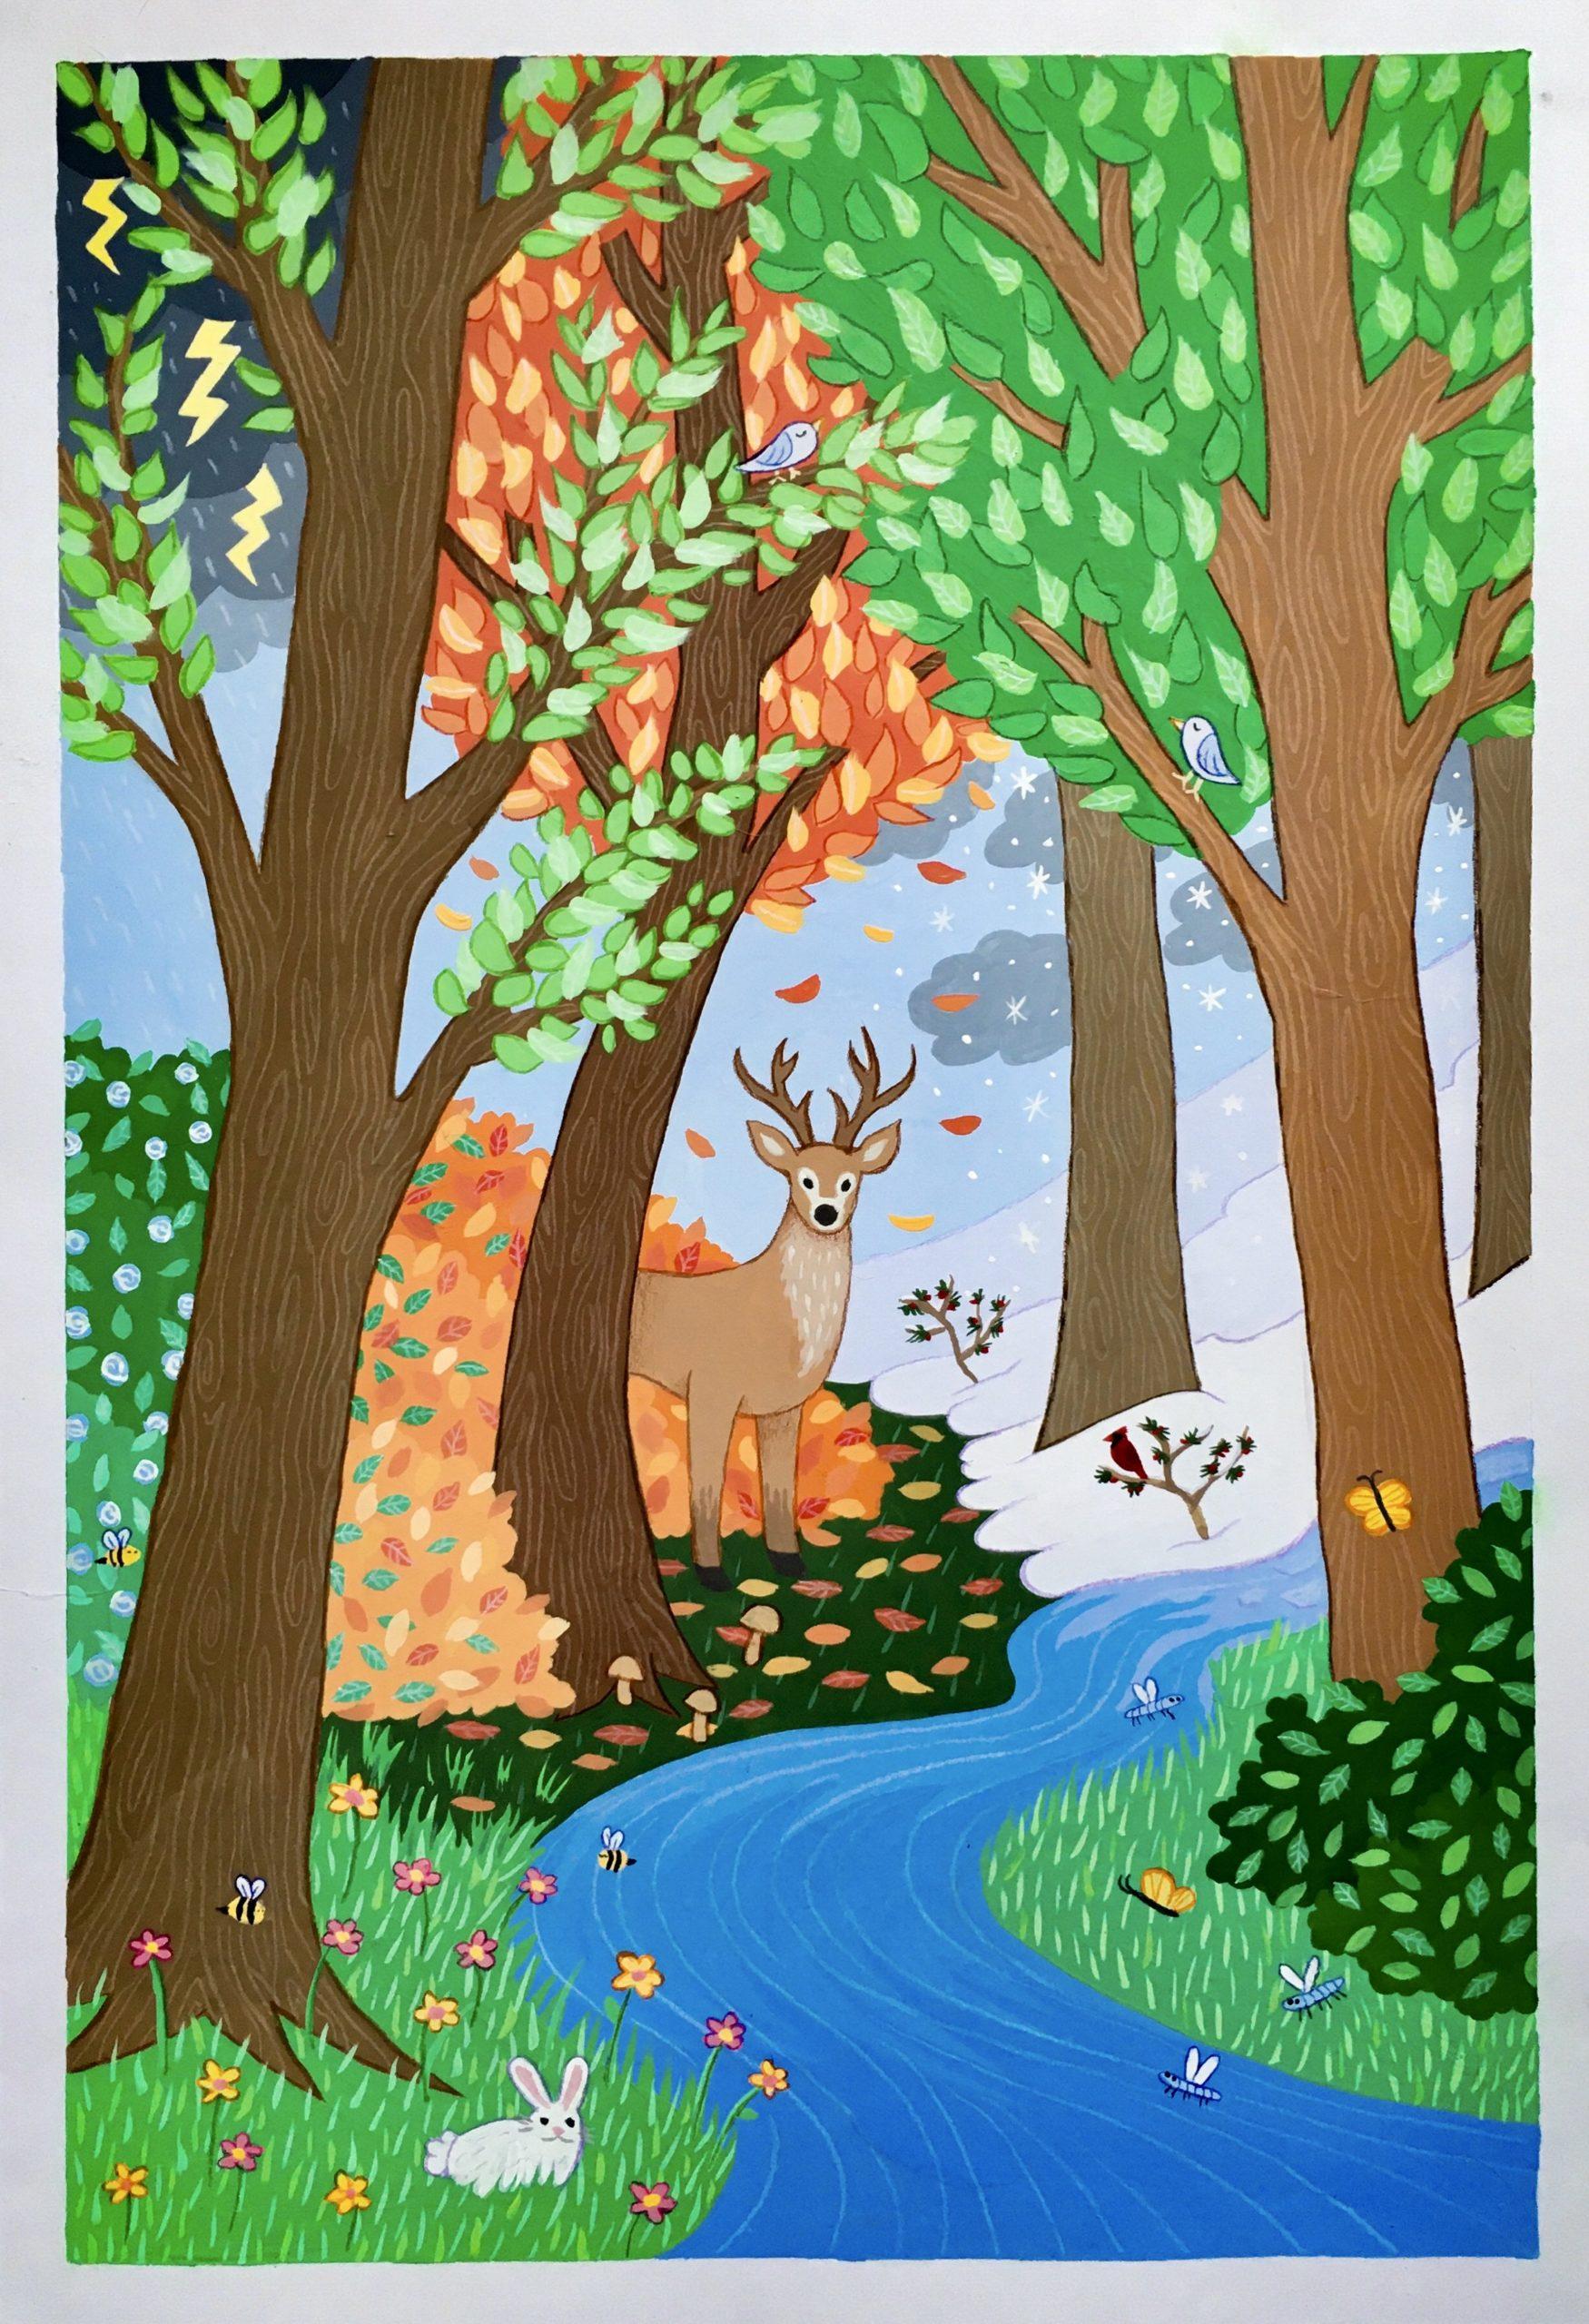 Vivaldi Four Seasons student artwork from MassArt, Leah Payne